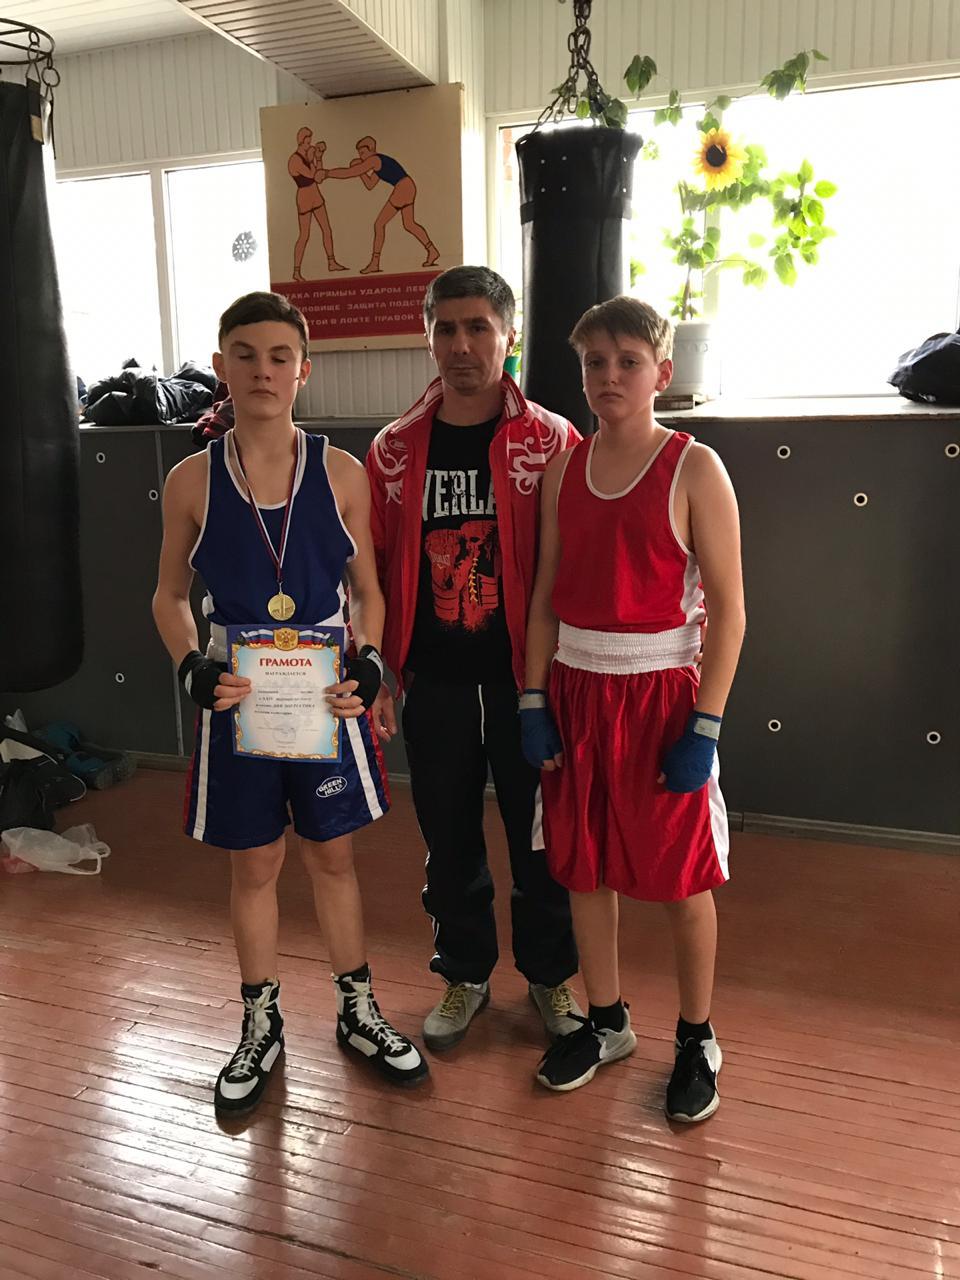 13-ти летний школьник отправил в нокаут соперника на турнире по боксу